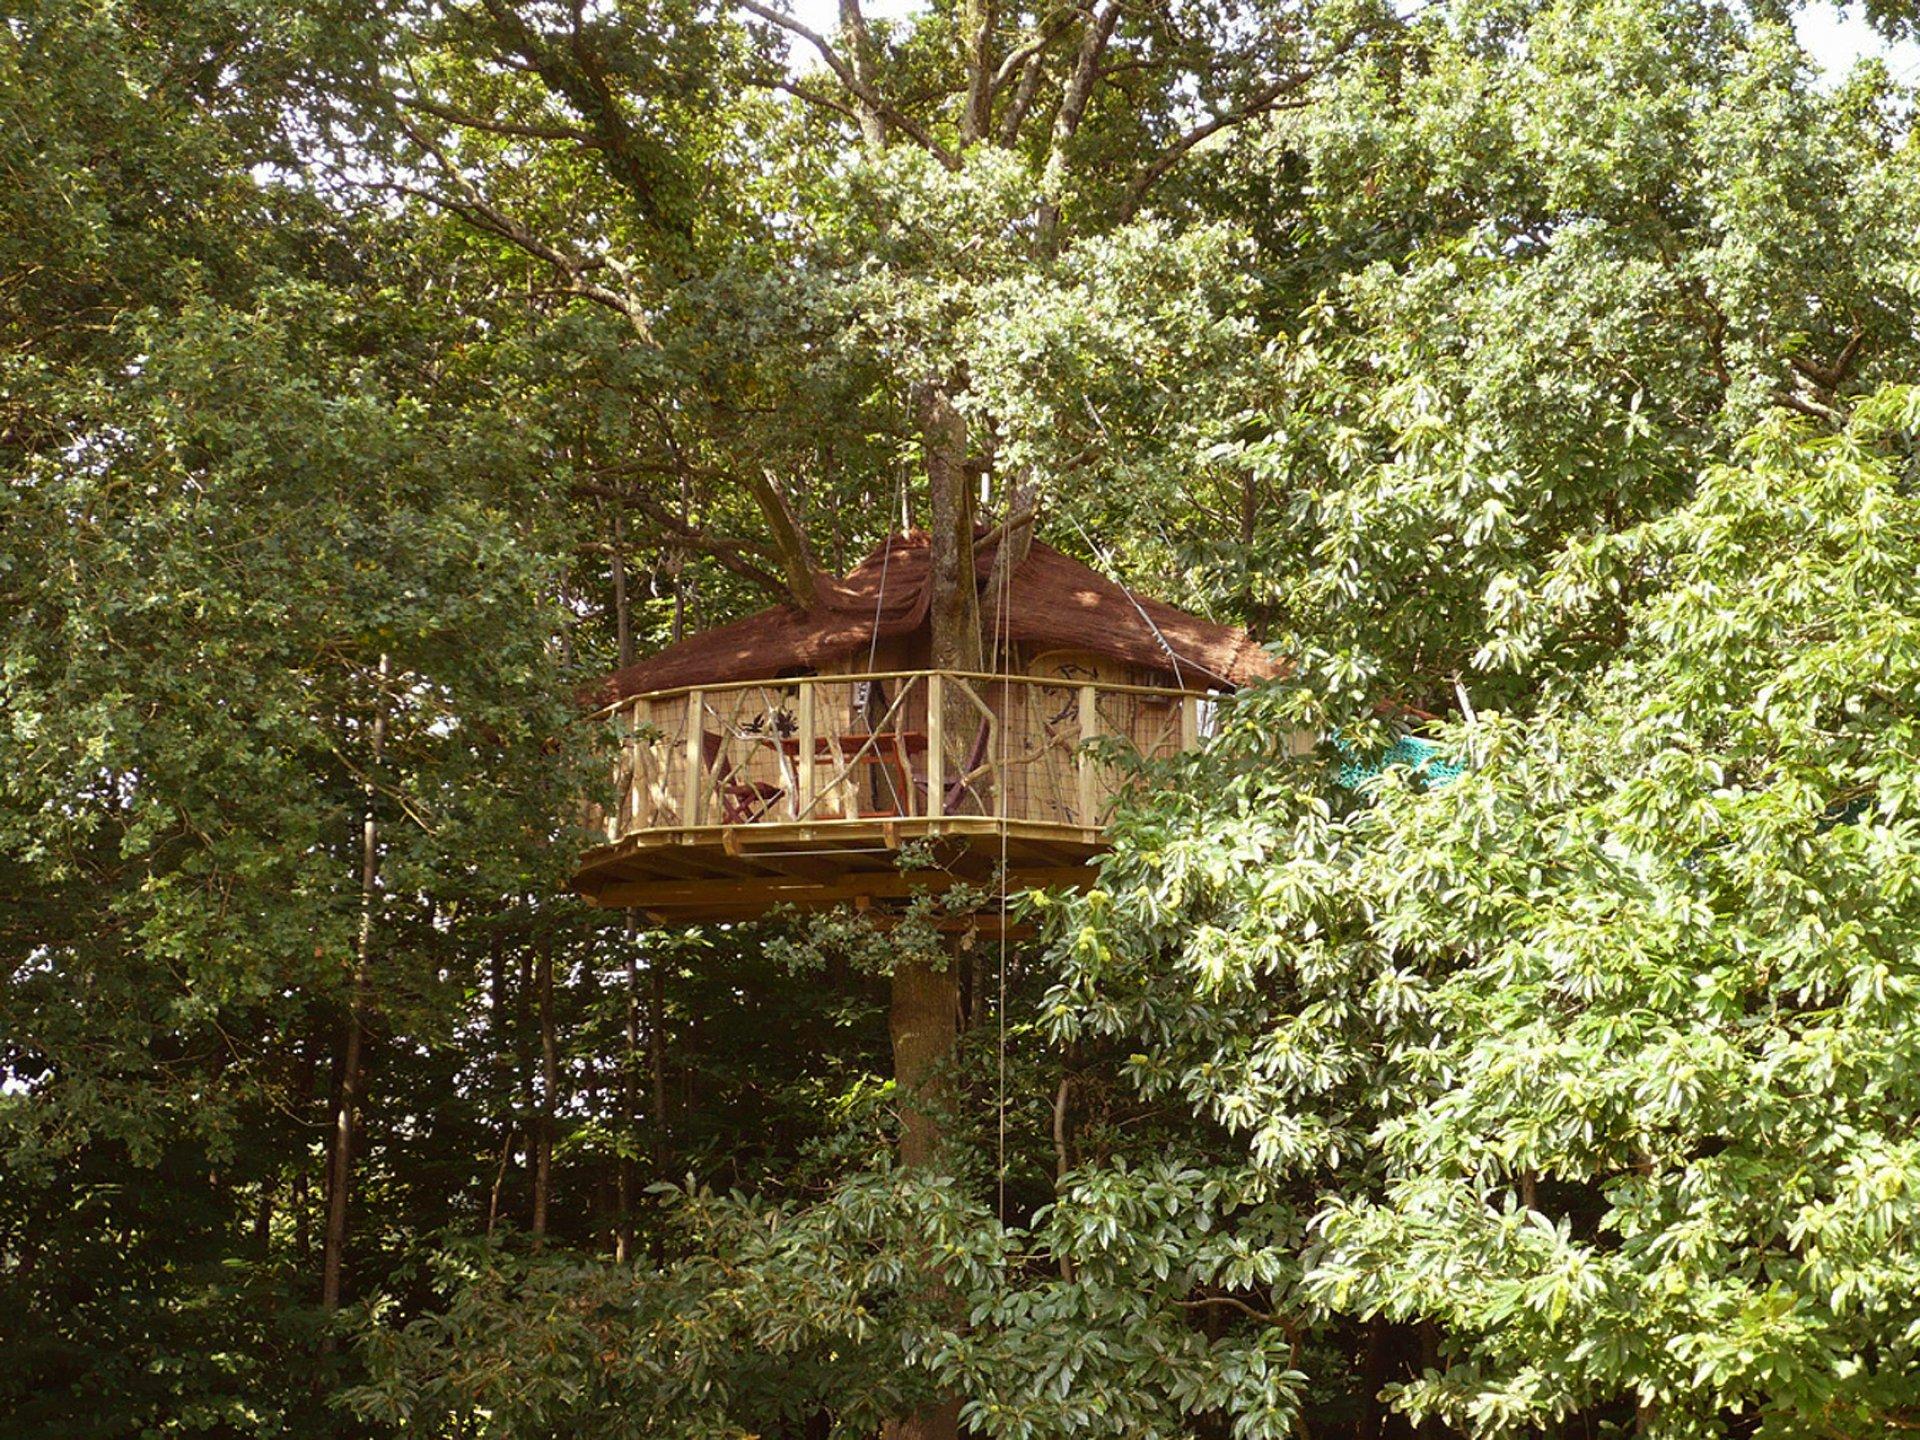 farfadets cabane dans les arbres bretagne hebergement insolite dormir bulle. Black Bedroom Furniture Sets. Home Design Ideas